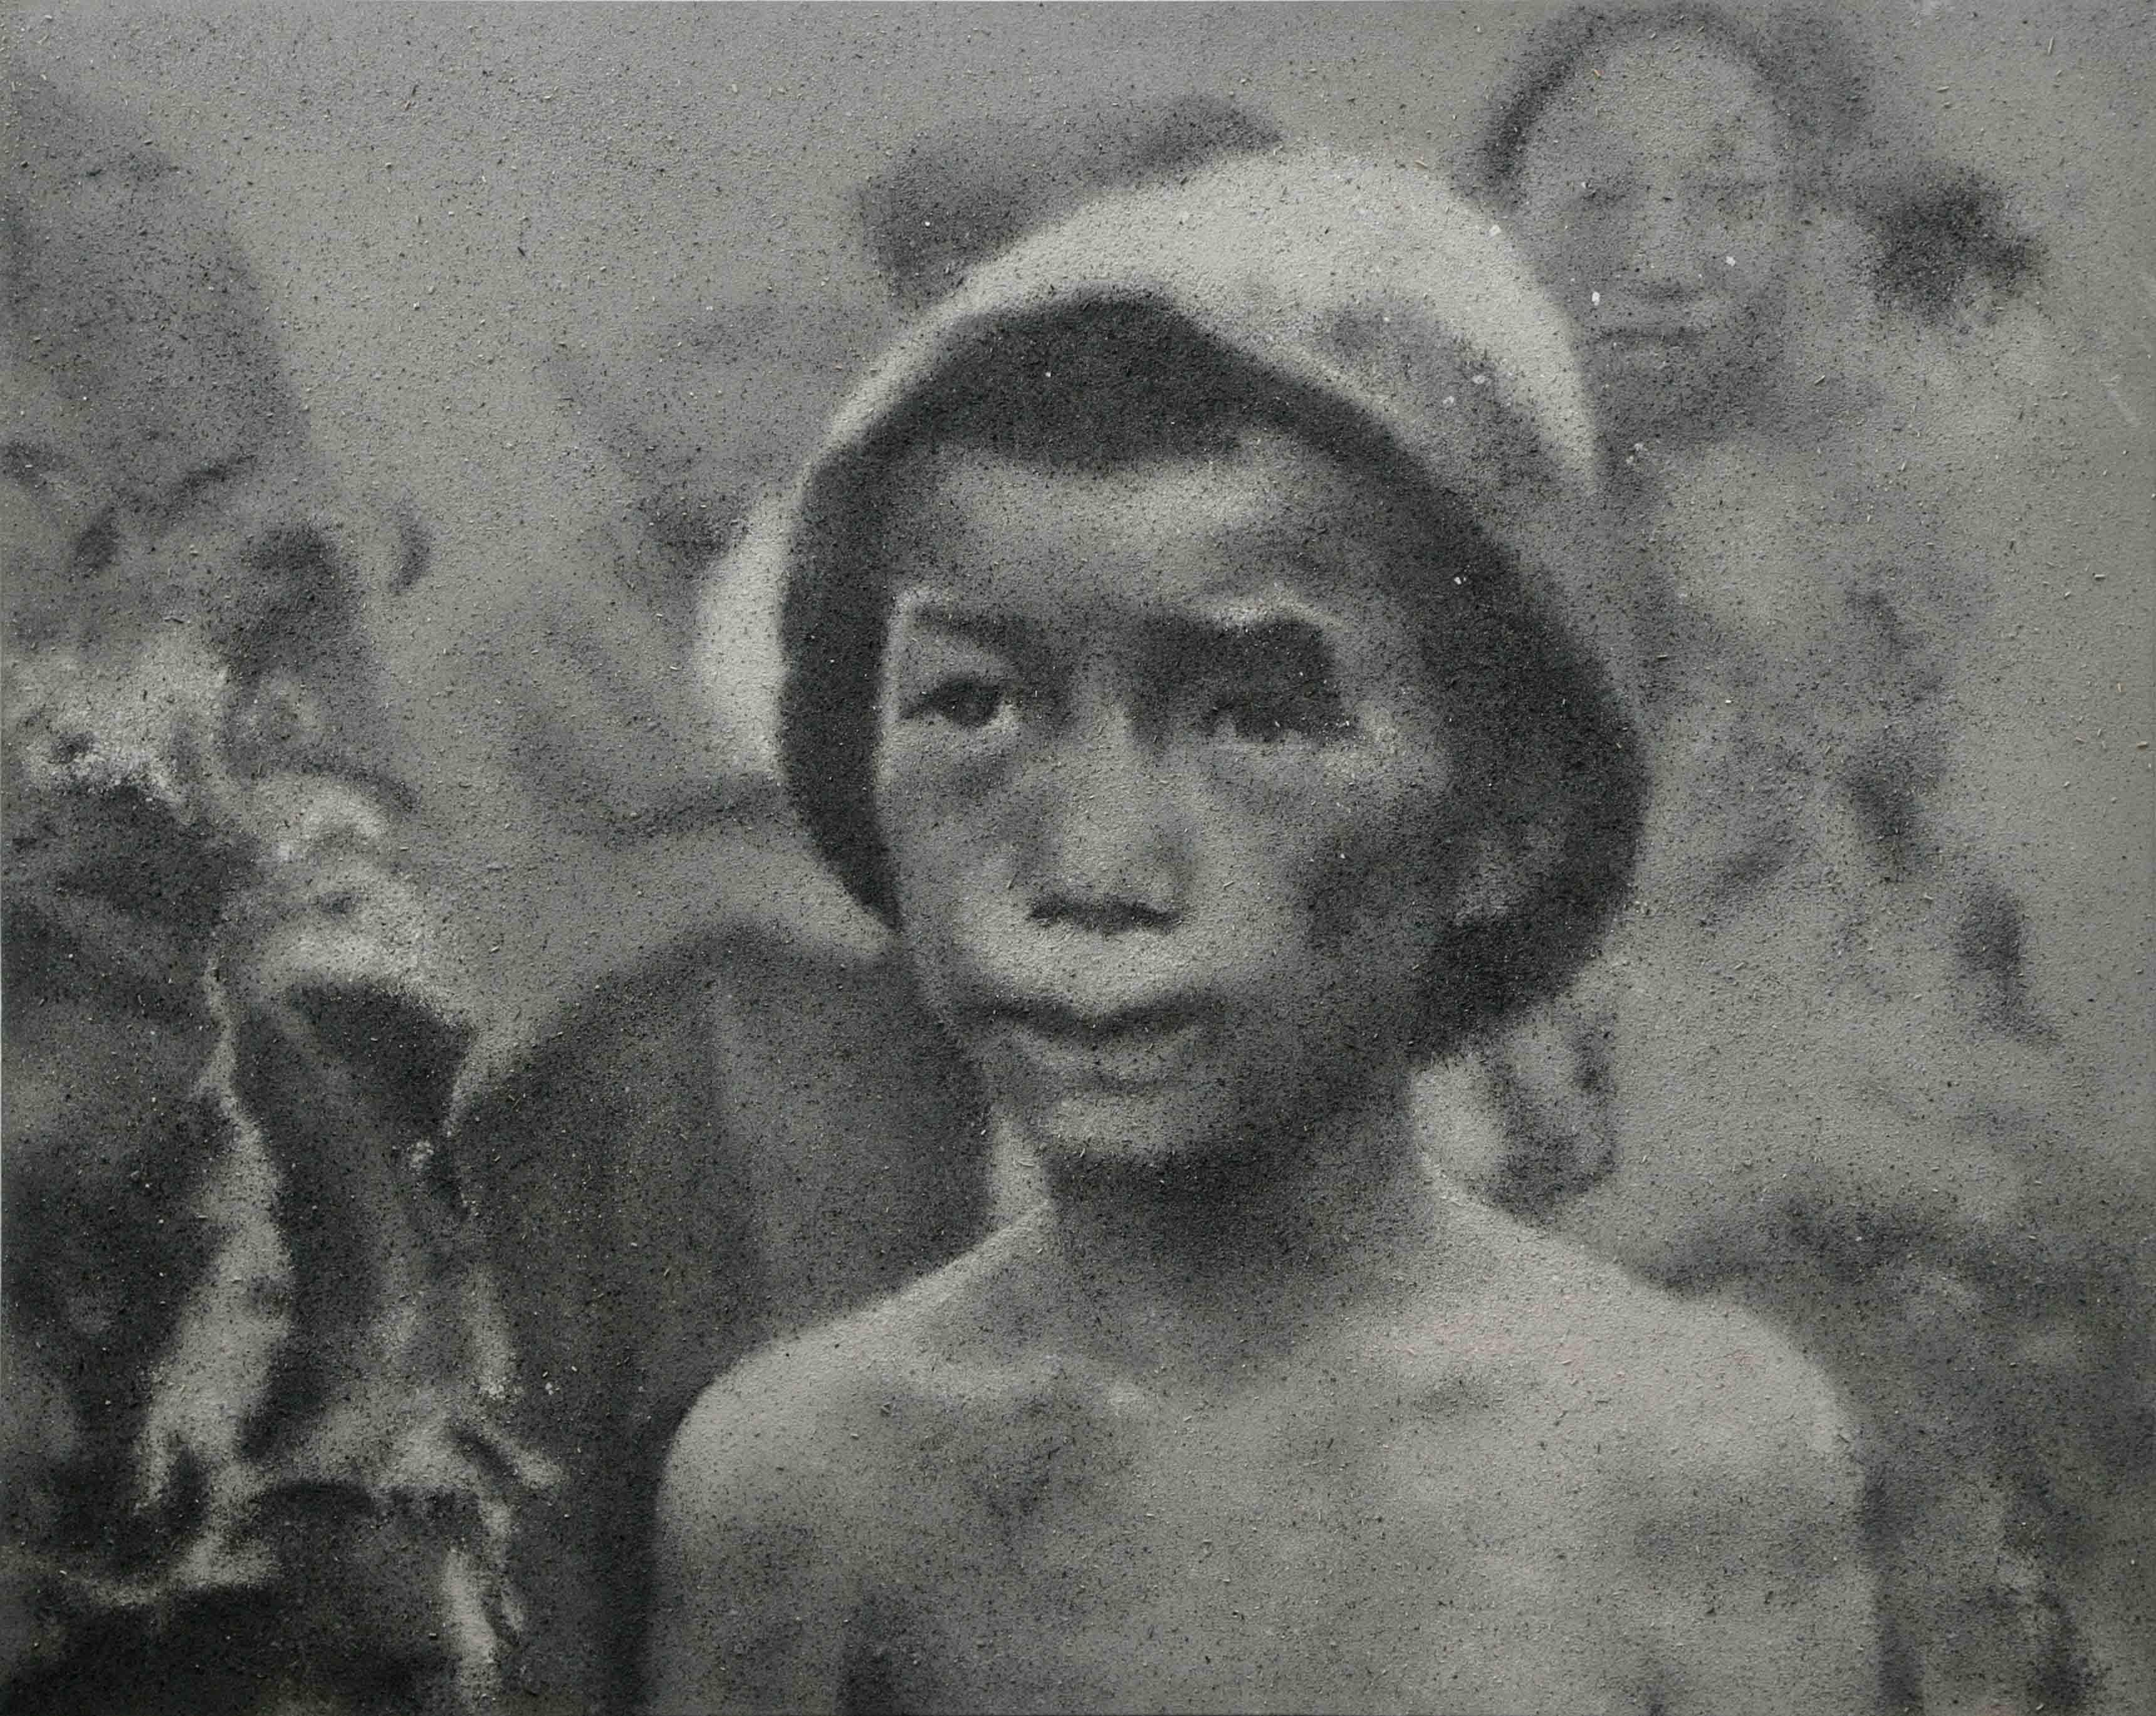 Child Labor, Zhang Huan (2007)